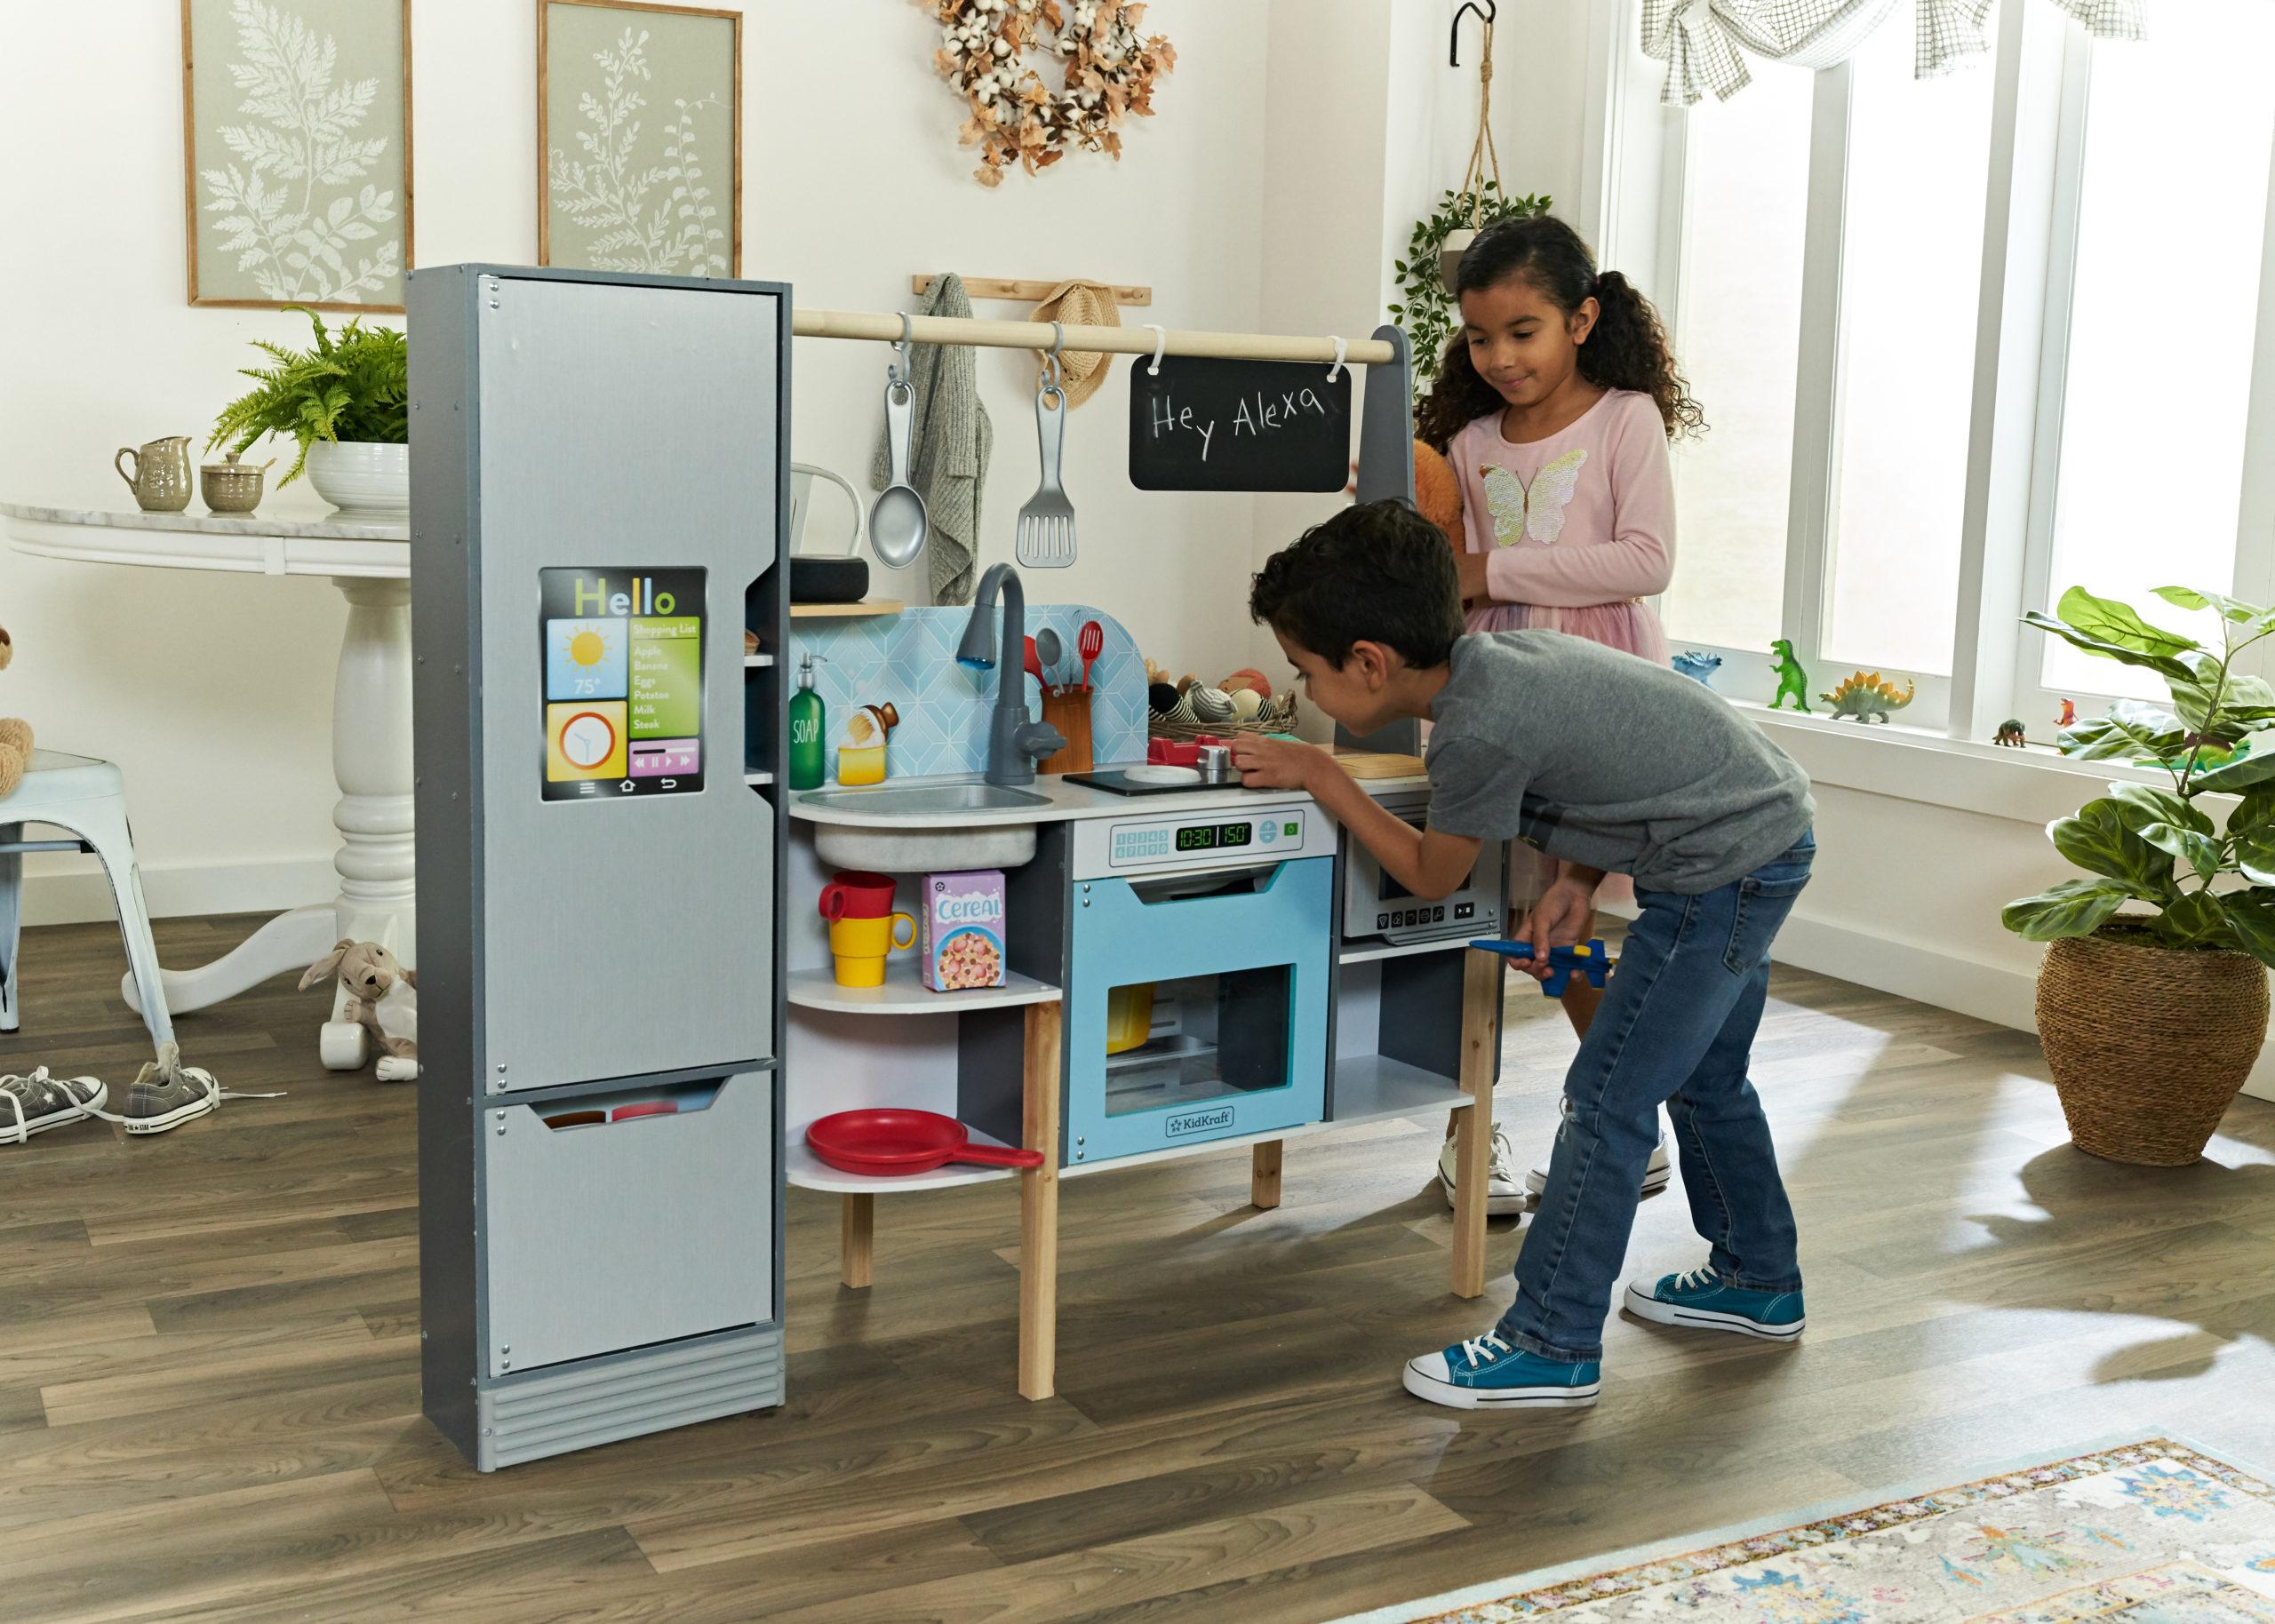 This interactive children's kitchen set comes with Alexa 15